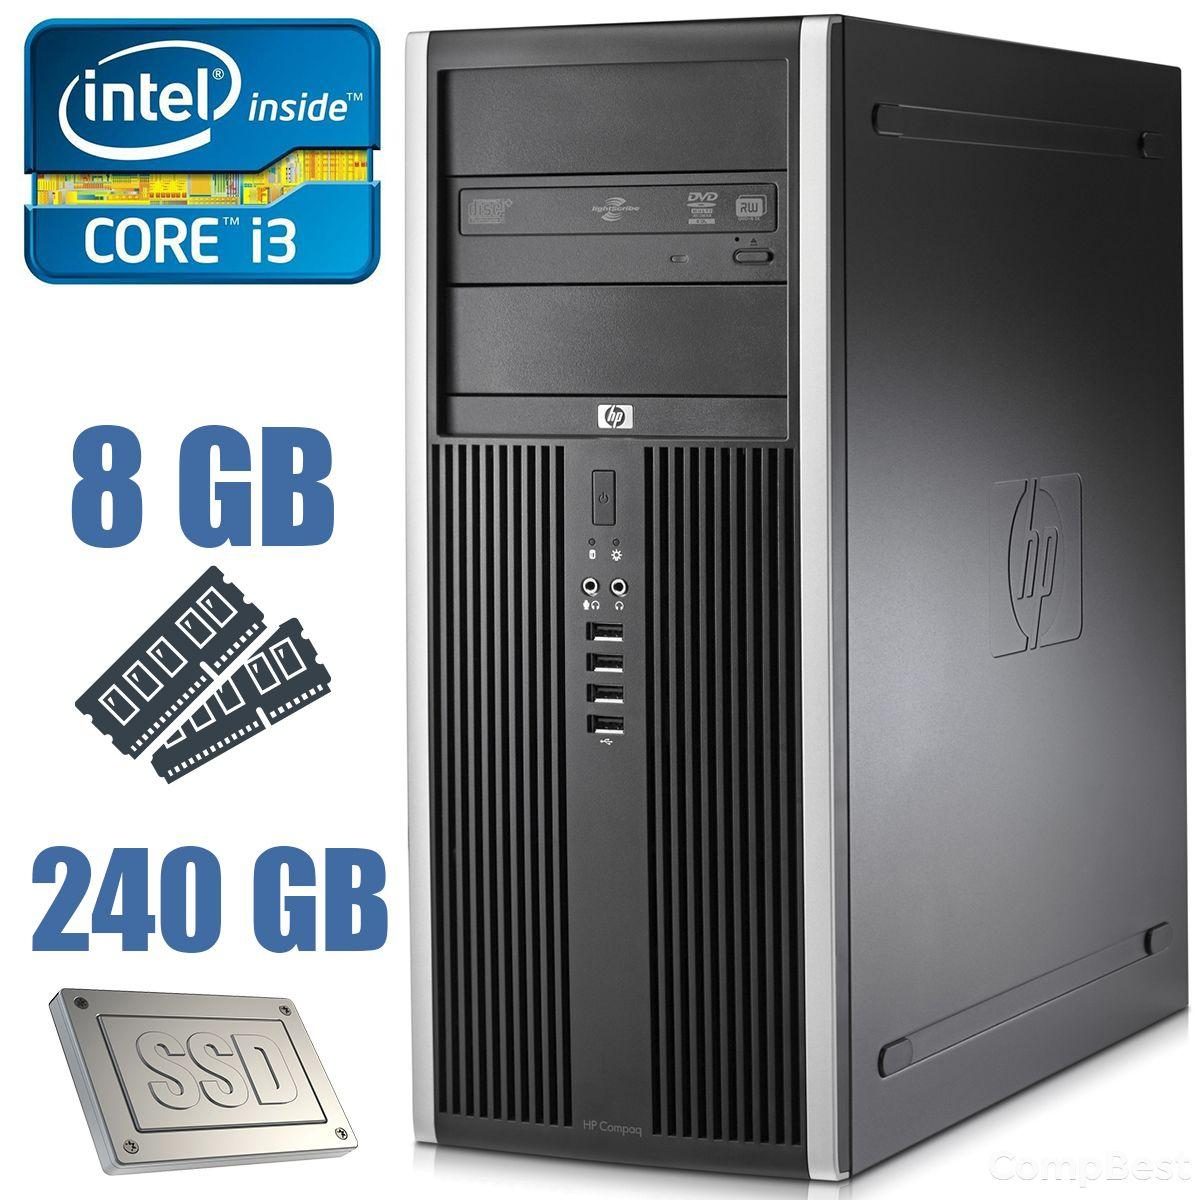 HP Compaq 8200 Elite Tower / Intel Core i3-2100 (2(4) ядра по 3.1GHz) / 8GB DDR3 / new! 240GB SSD